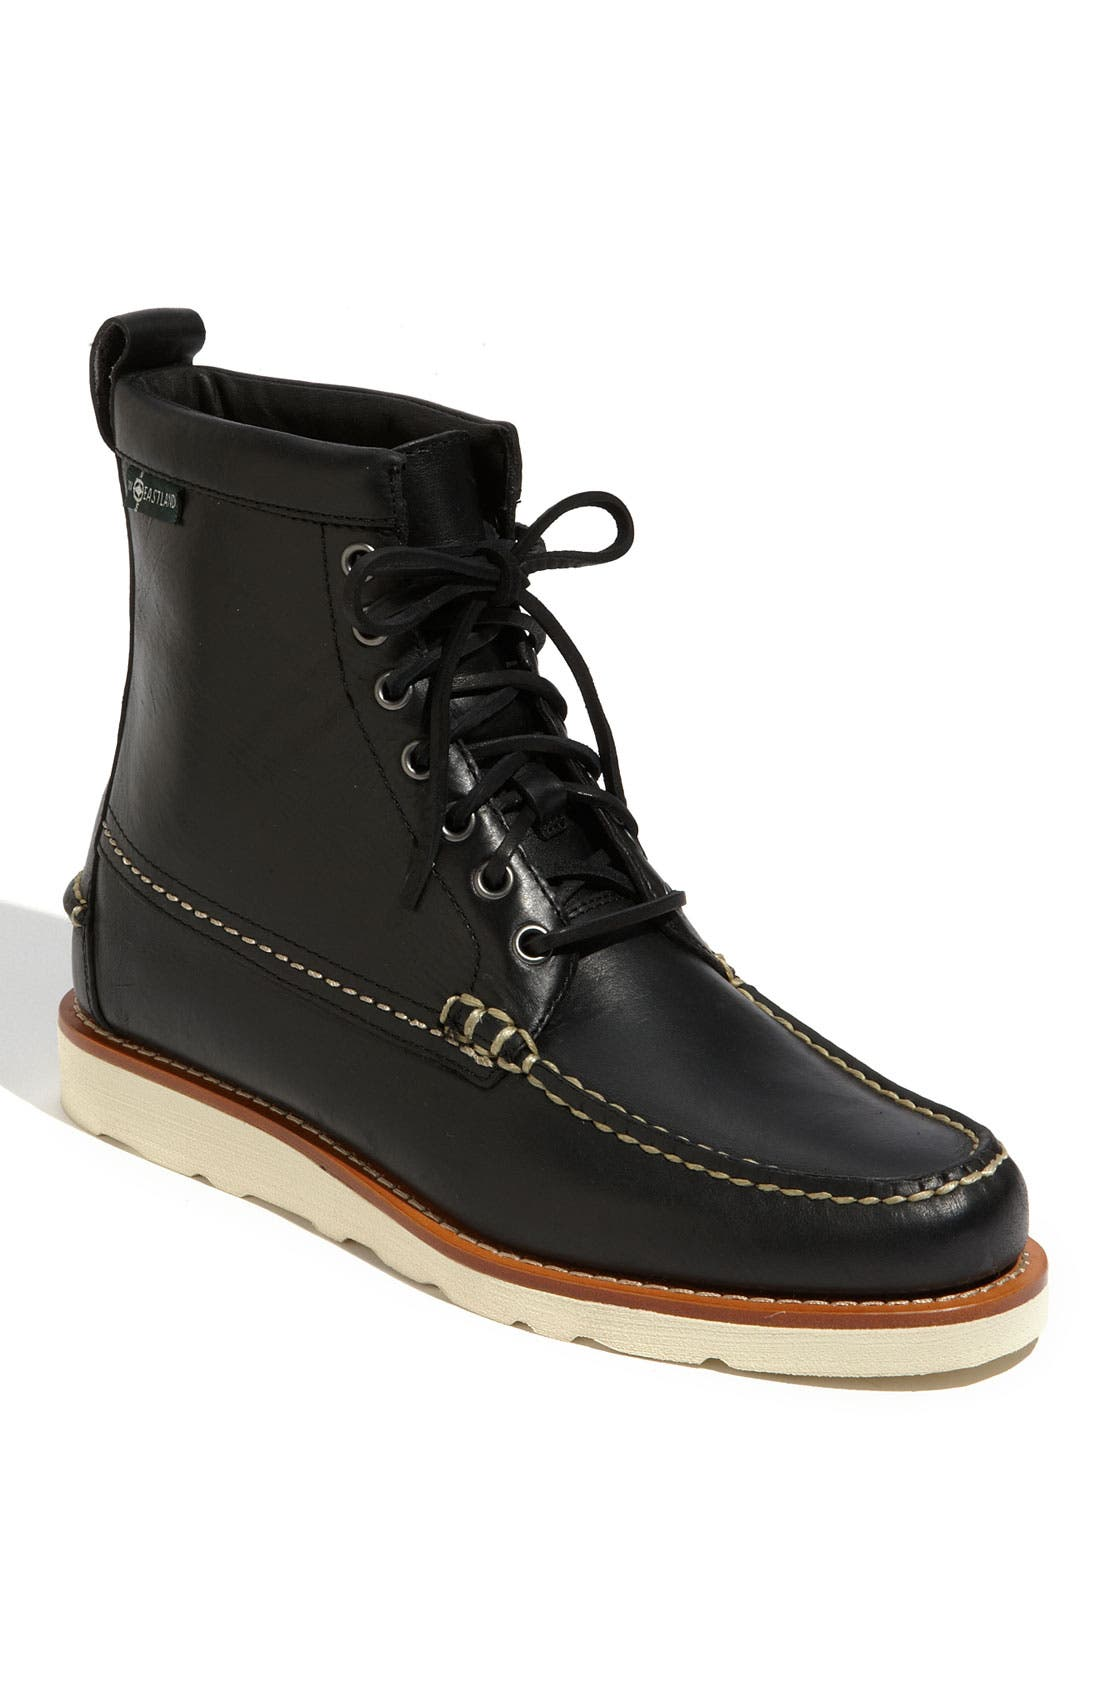 'Sherman 1955' Boot